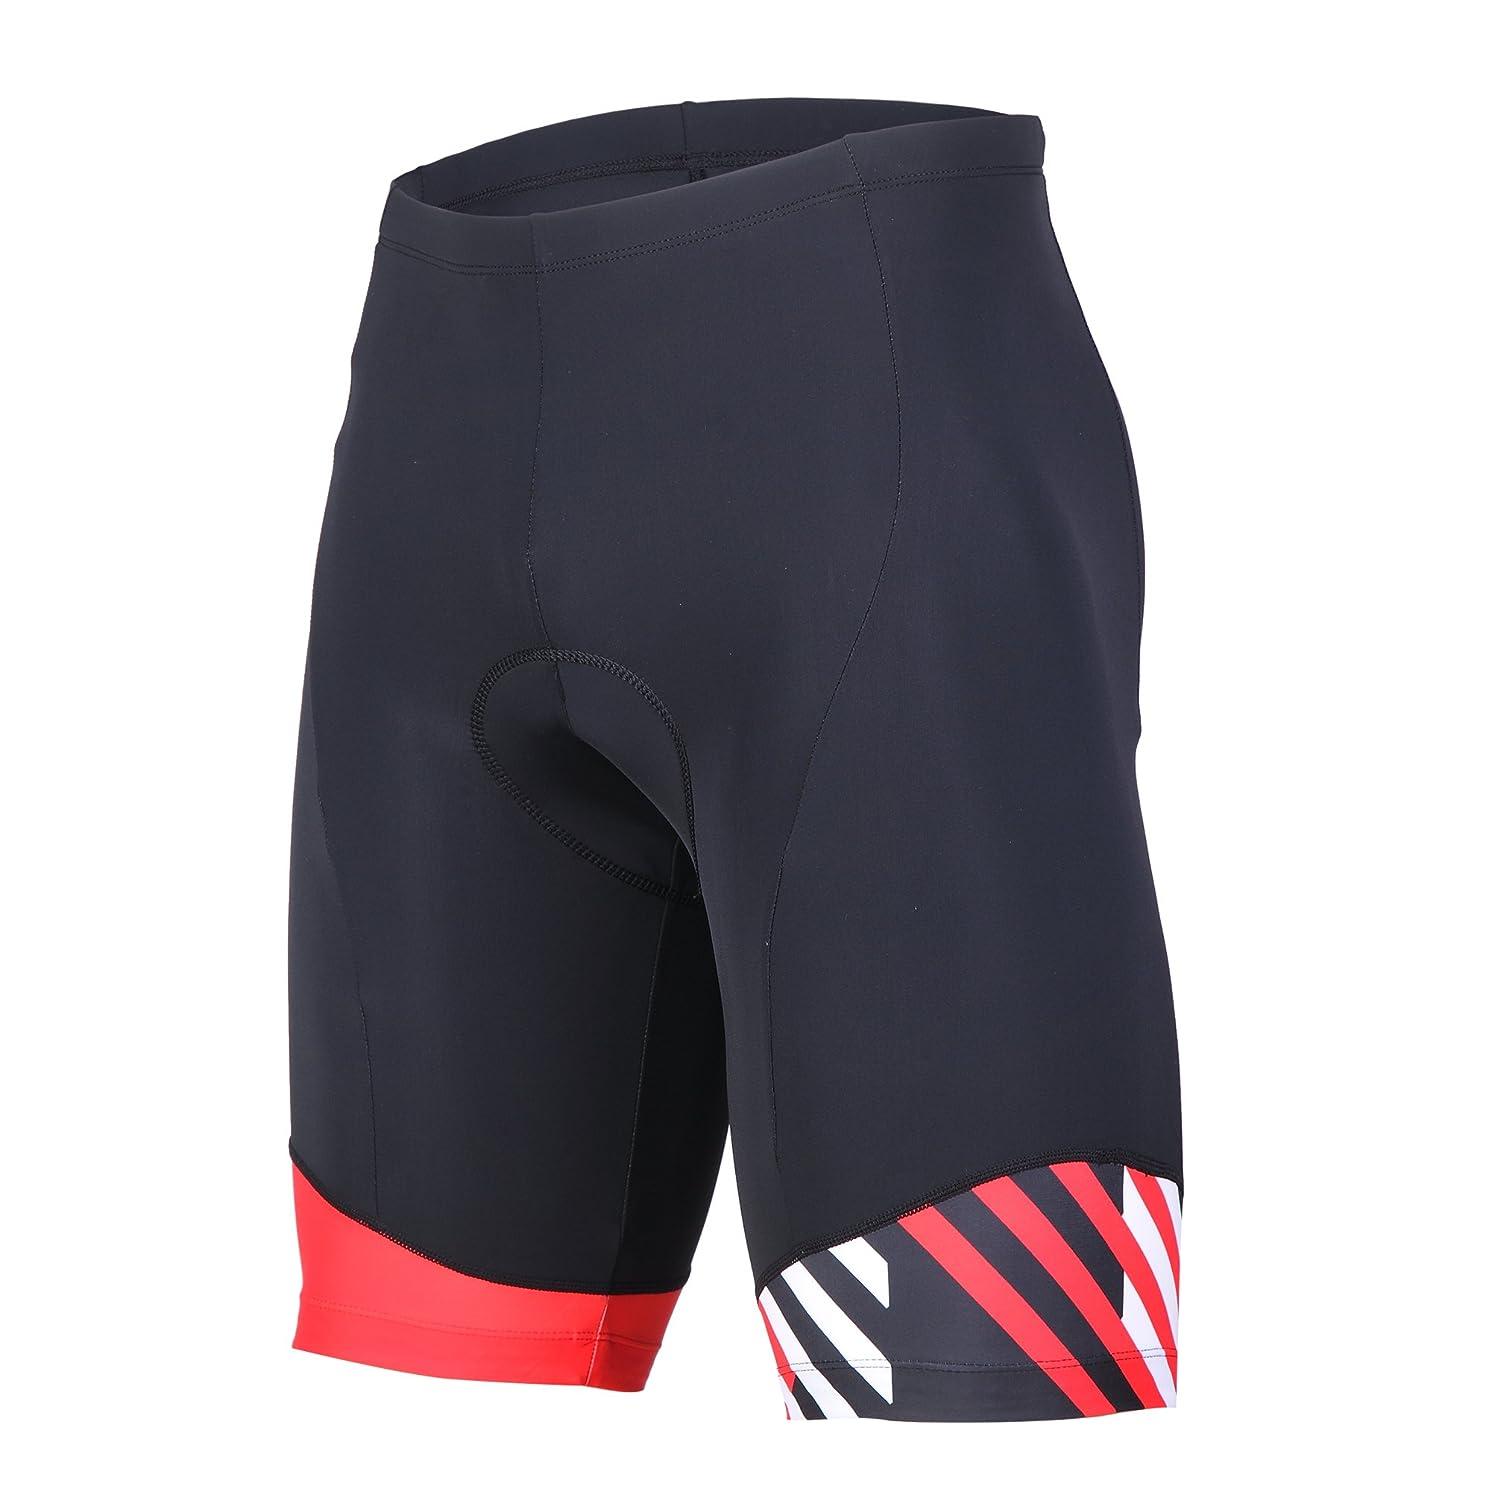 ANIVIVO Mens Cycling Shorts Padded &Bicycle Riding Shorts with Anti-Slip Belt &Road Bike Shorts Comfort Tight Biking Shorts for Men